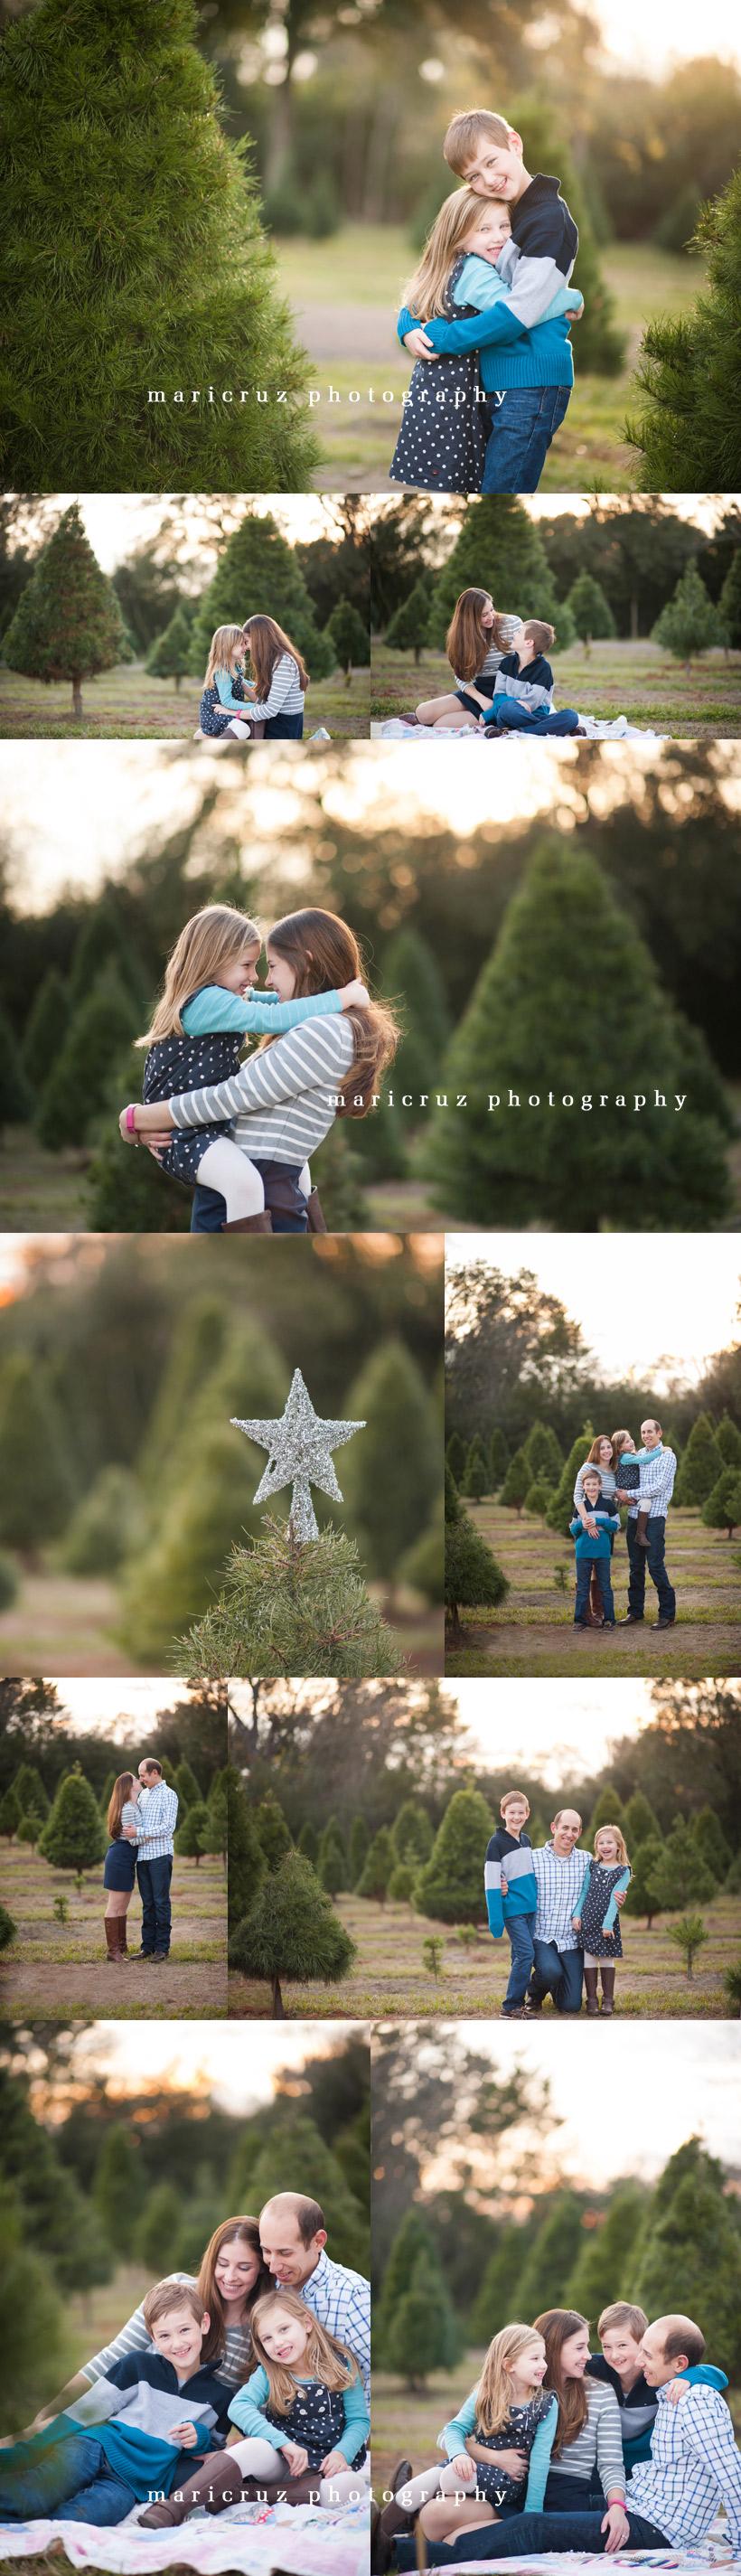 Tree Farm The Woodlands Tx Family Photographer Christmas Tree Farm Pictures Christmas Tree Farm Photos Family Holiday Photos